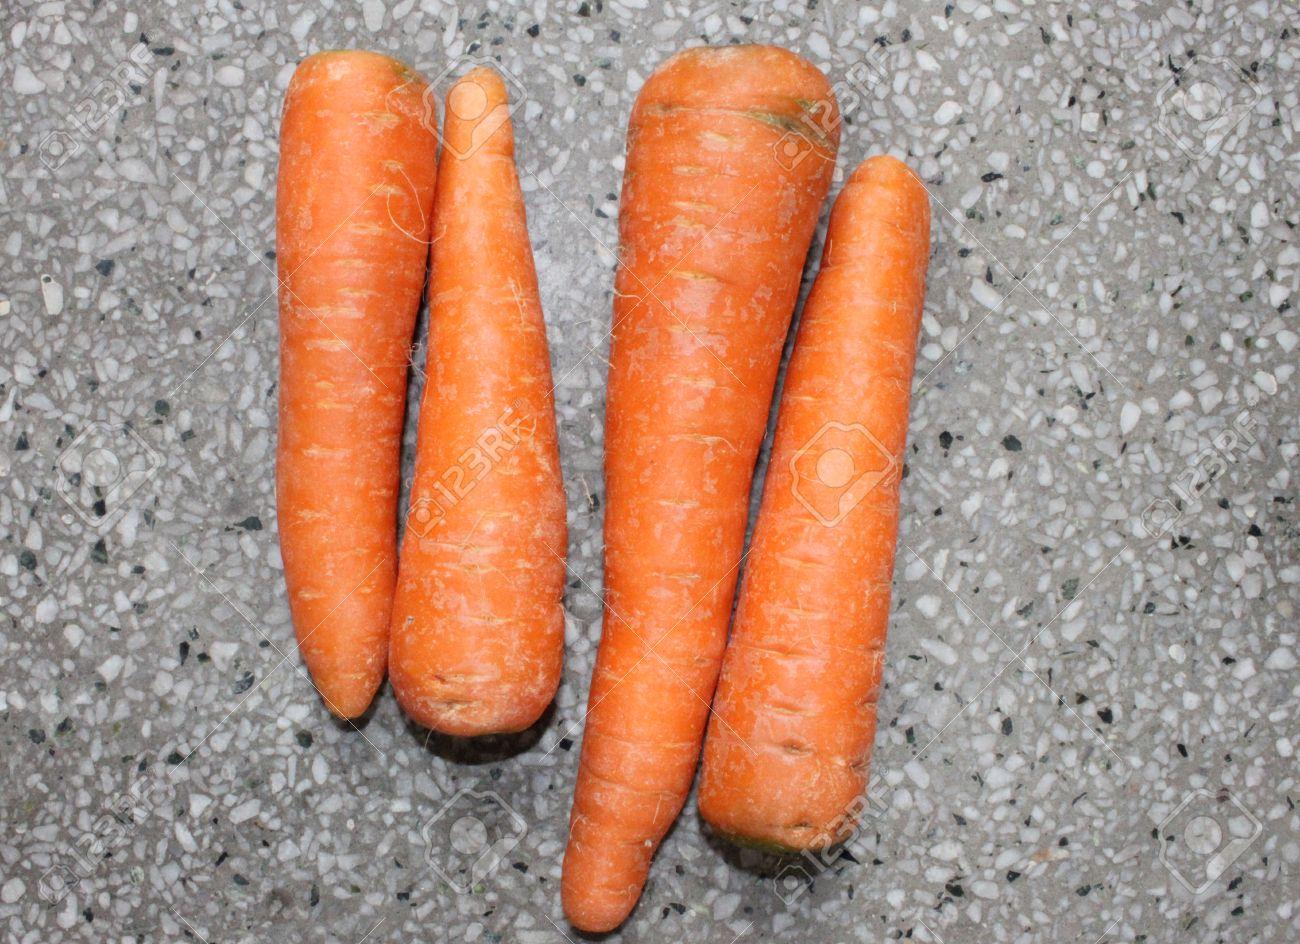 Golden Carrot, Daucus carota, Gajjar in India, conical fleshy